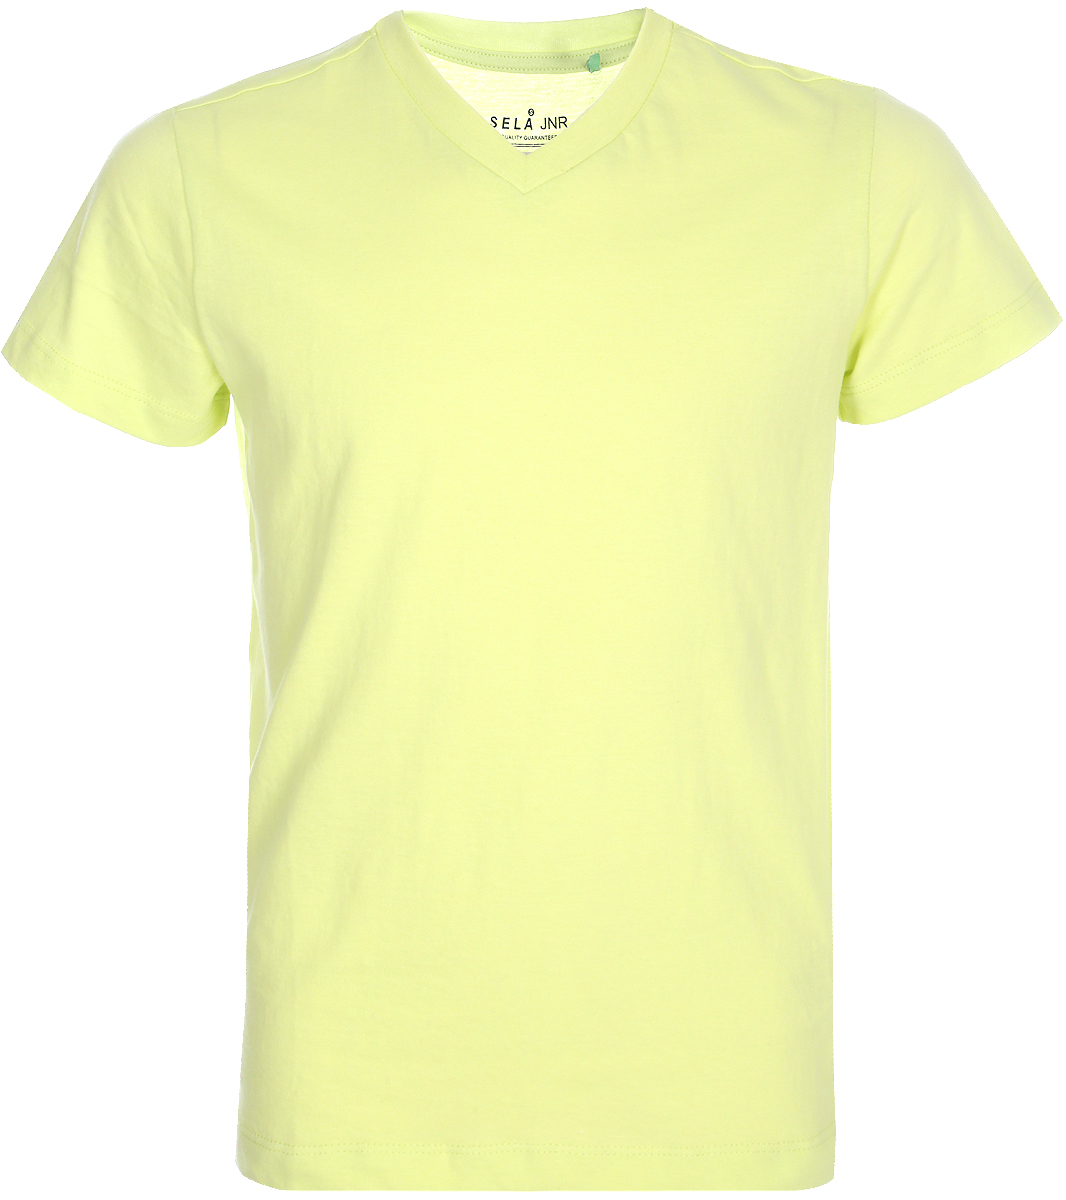 Футболка для мальчика Sela, цвет: желтый. Ts-811/303-8152. Размер 128Ts-811/303-8152